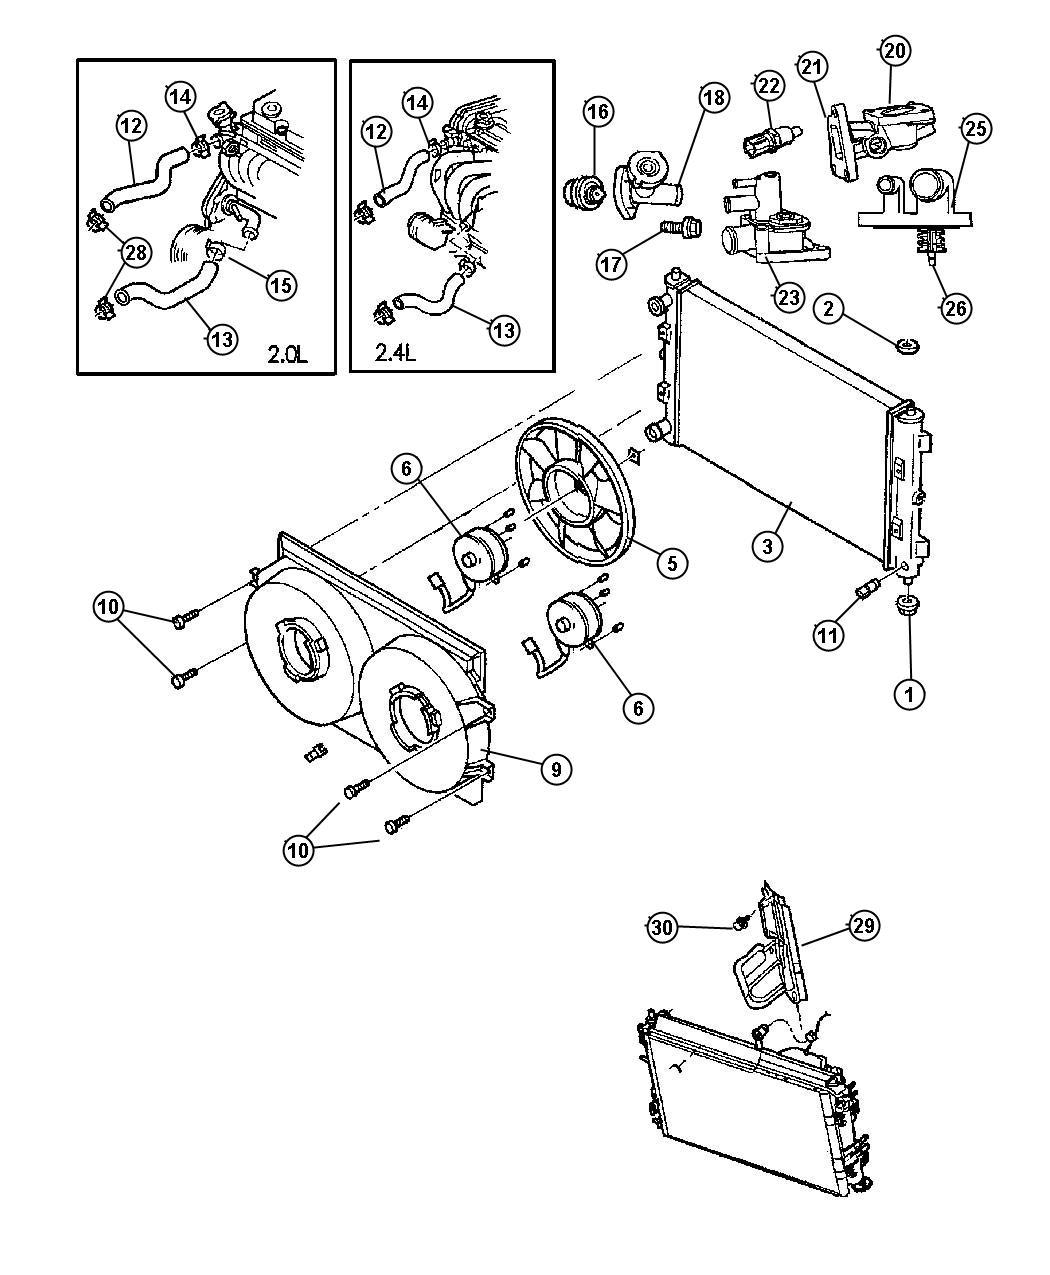 Dodge Stratus Radiator Engine Cooling Related Ecc